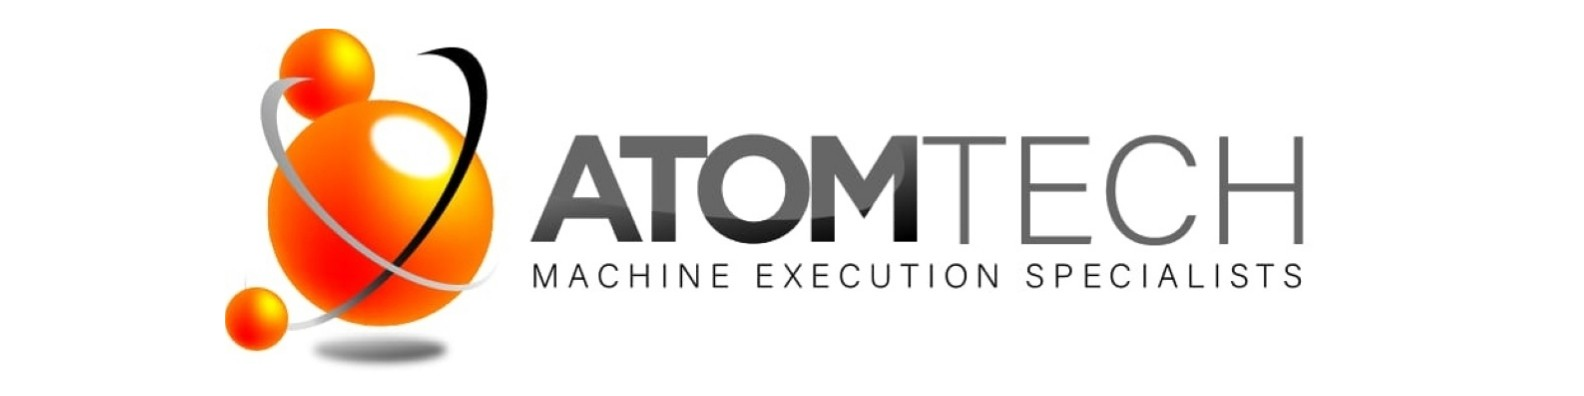 atom tech logo-1